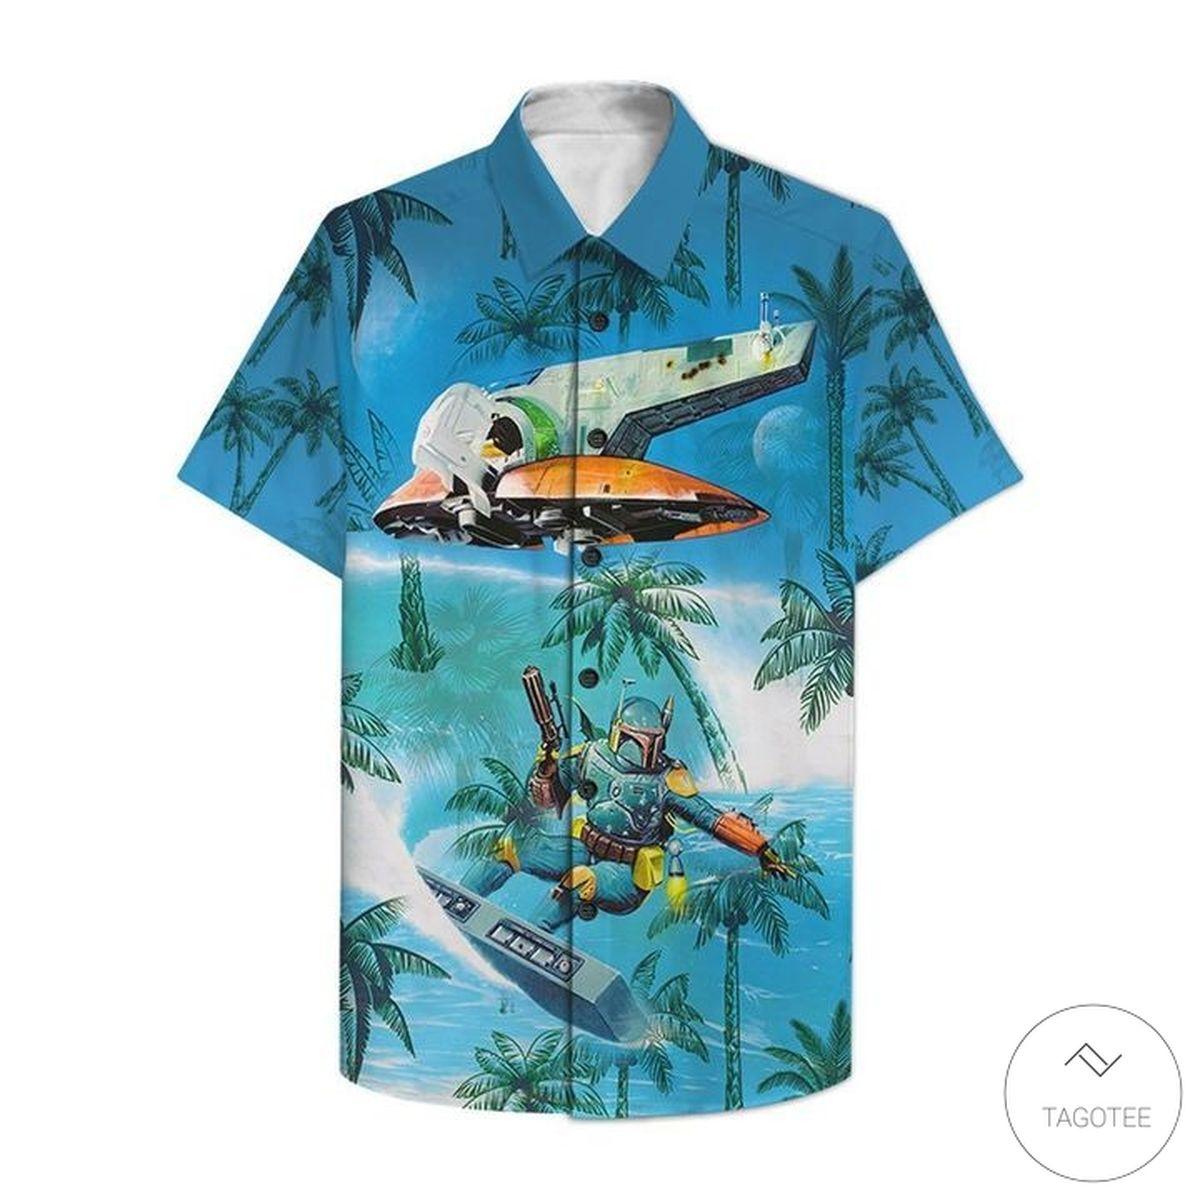 Hot Mandalorian Surfing Hawaiian Shirt, Beach Shorts